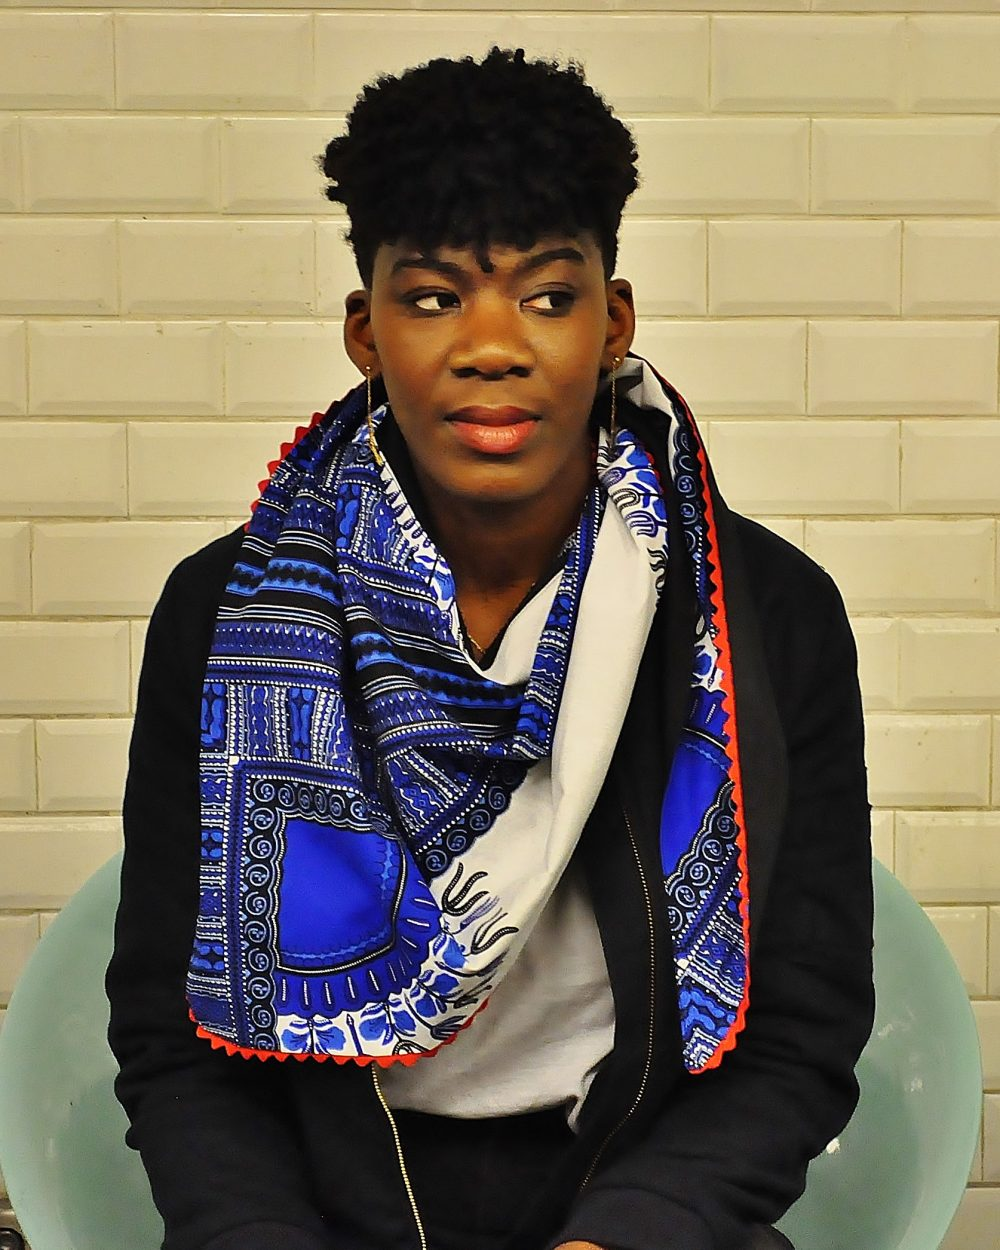 hooting Le Noeud Kipé - Accessoires Wax Tissu africain - Cheche addis Abeba bleu